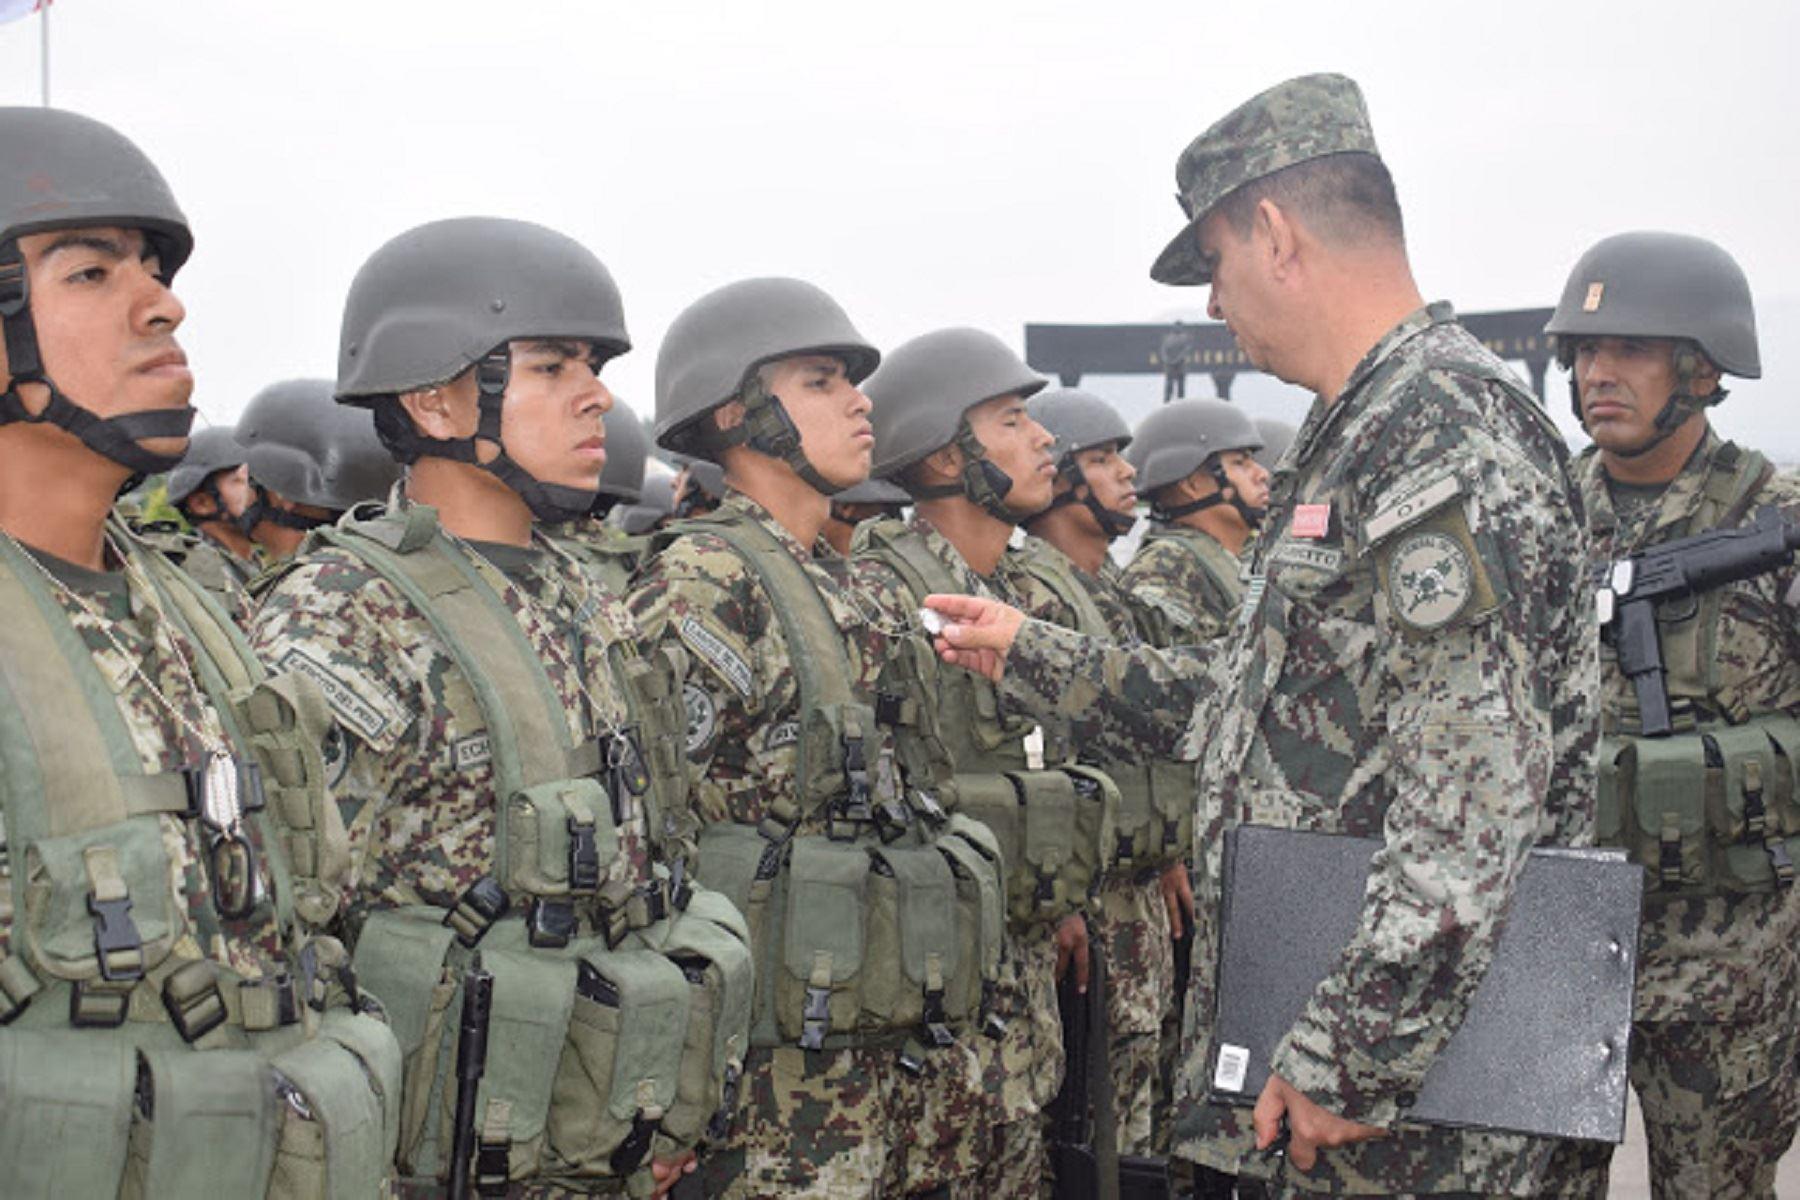 Ejército peruano realiza espectacular demostración en paracaídas ...